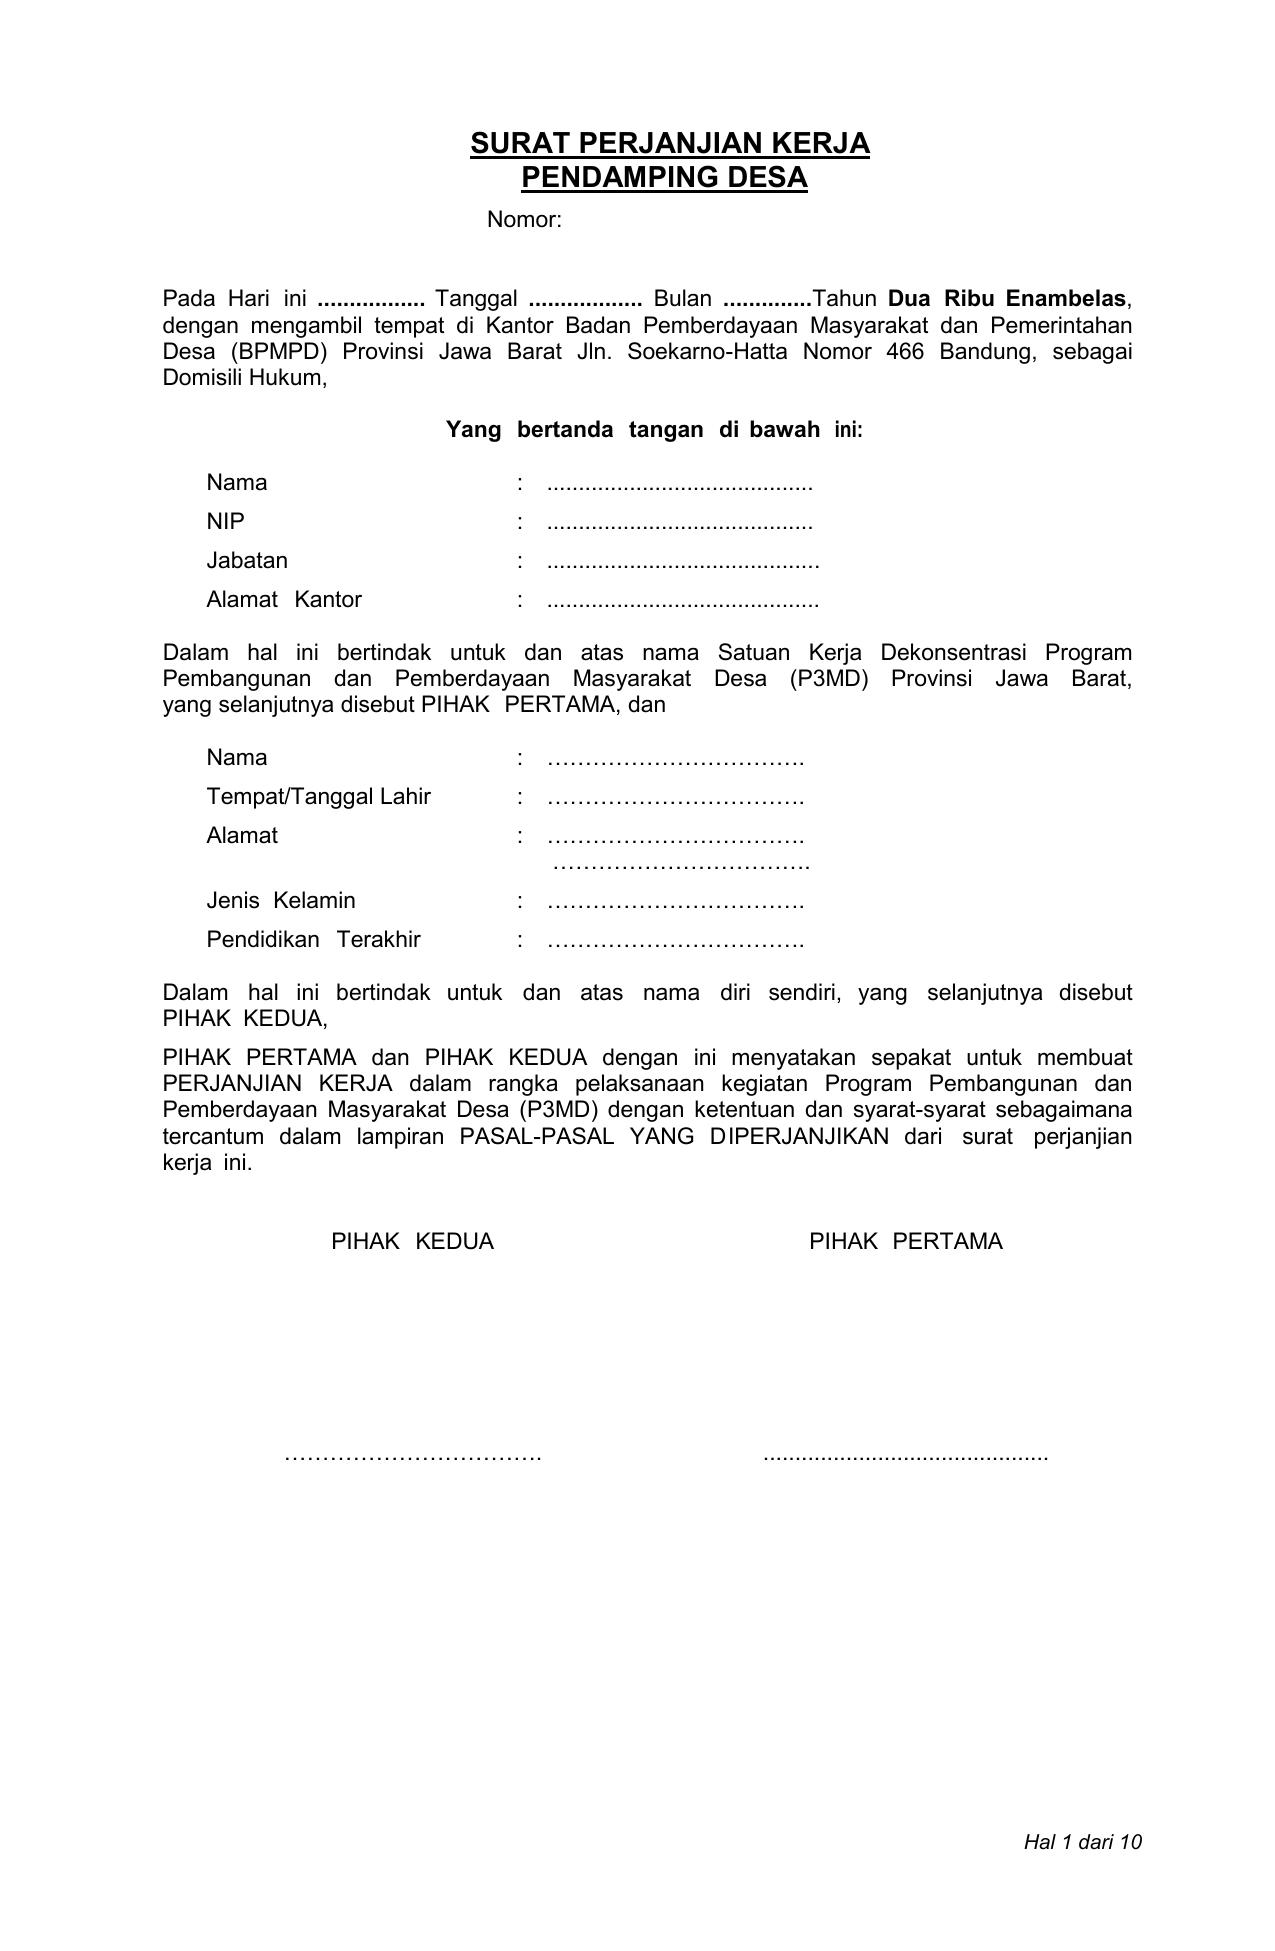 Surat Perjanjian Kerja Pendamping Desa Dpm